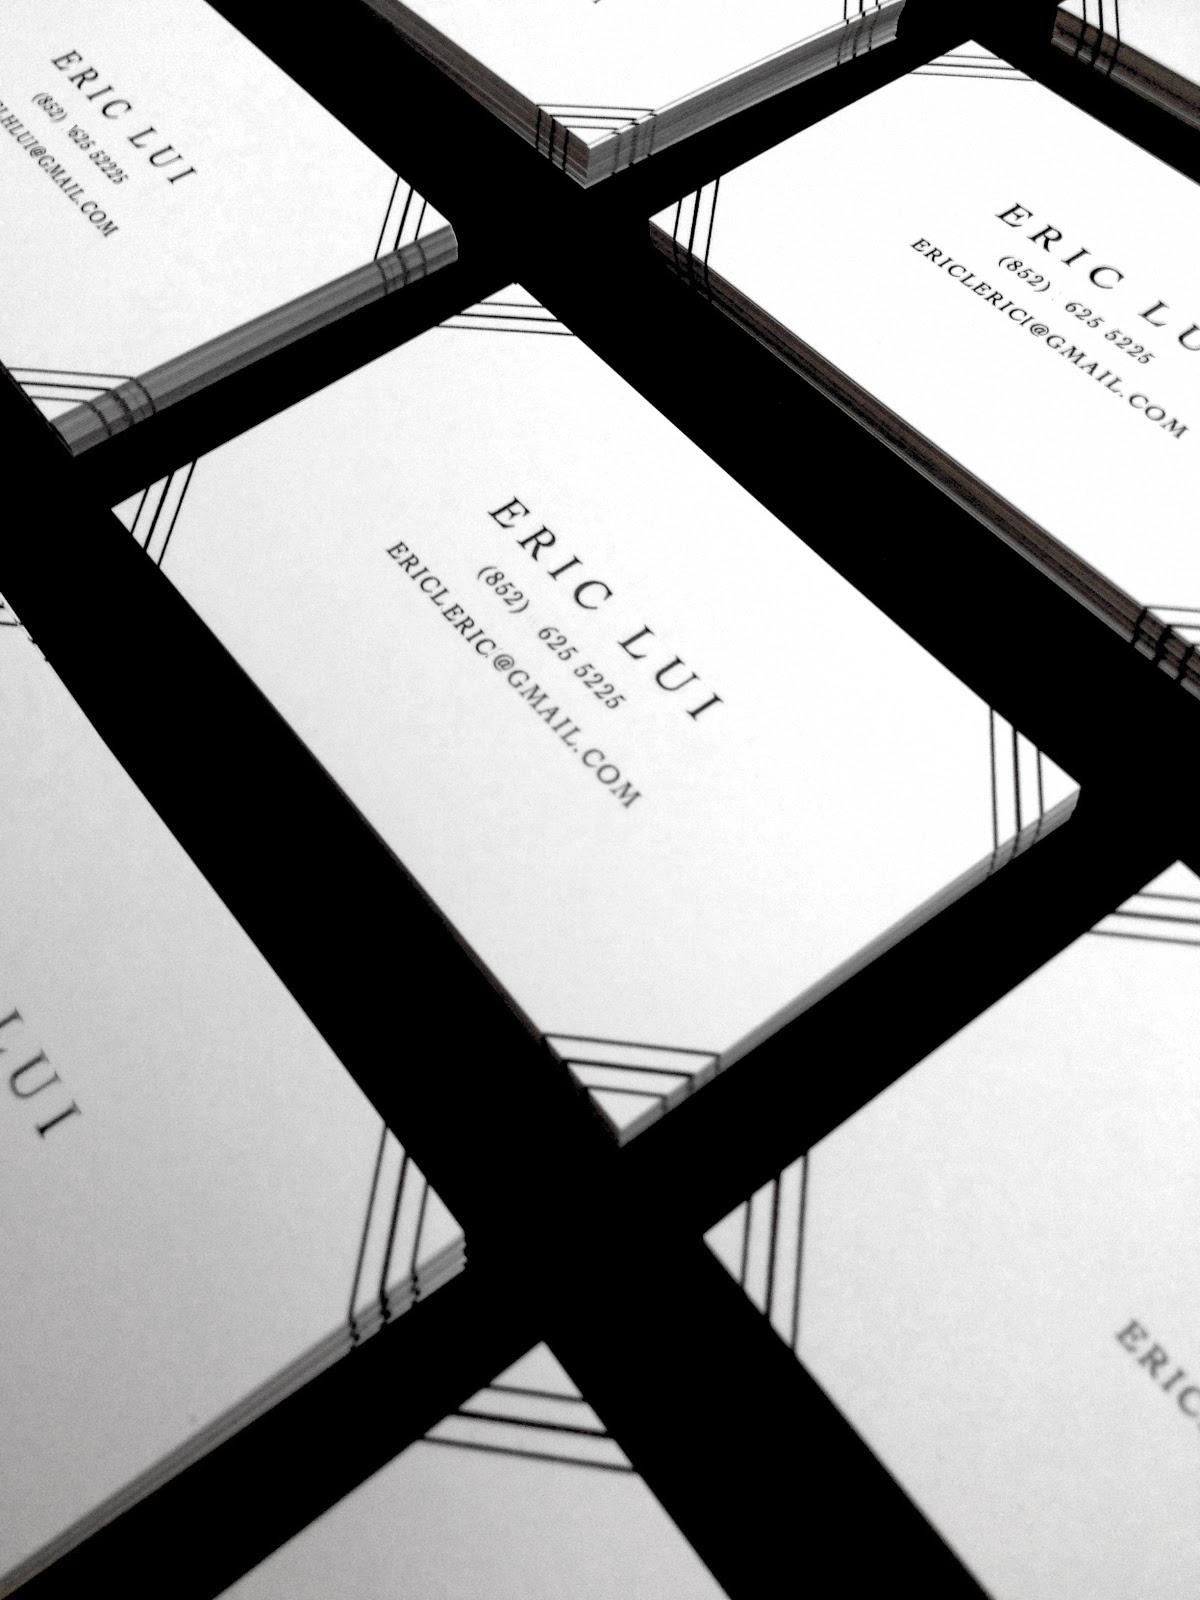 Kalo make art bespoke wedding invitation designs bespoke business kalo make art bespoke wedding invitation designs bespoke business card designs in hong kong reheart Image collections